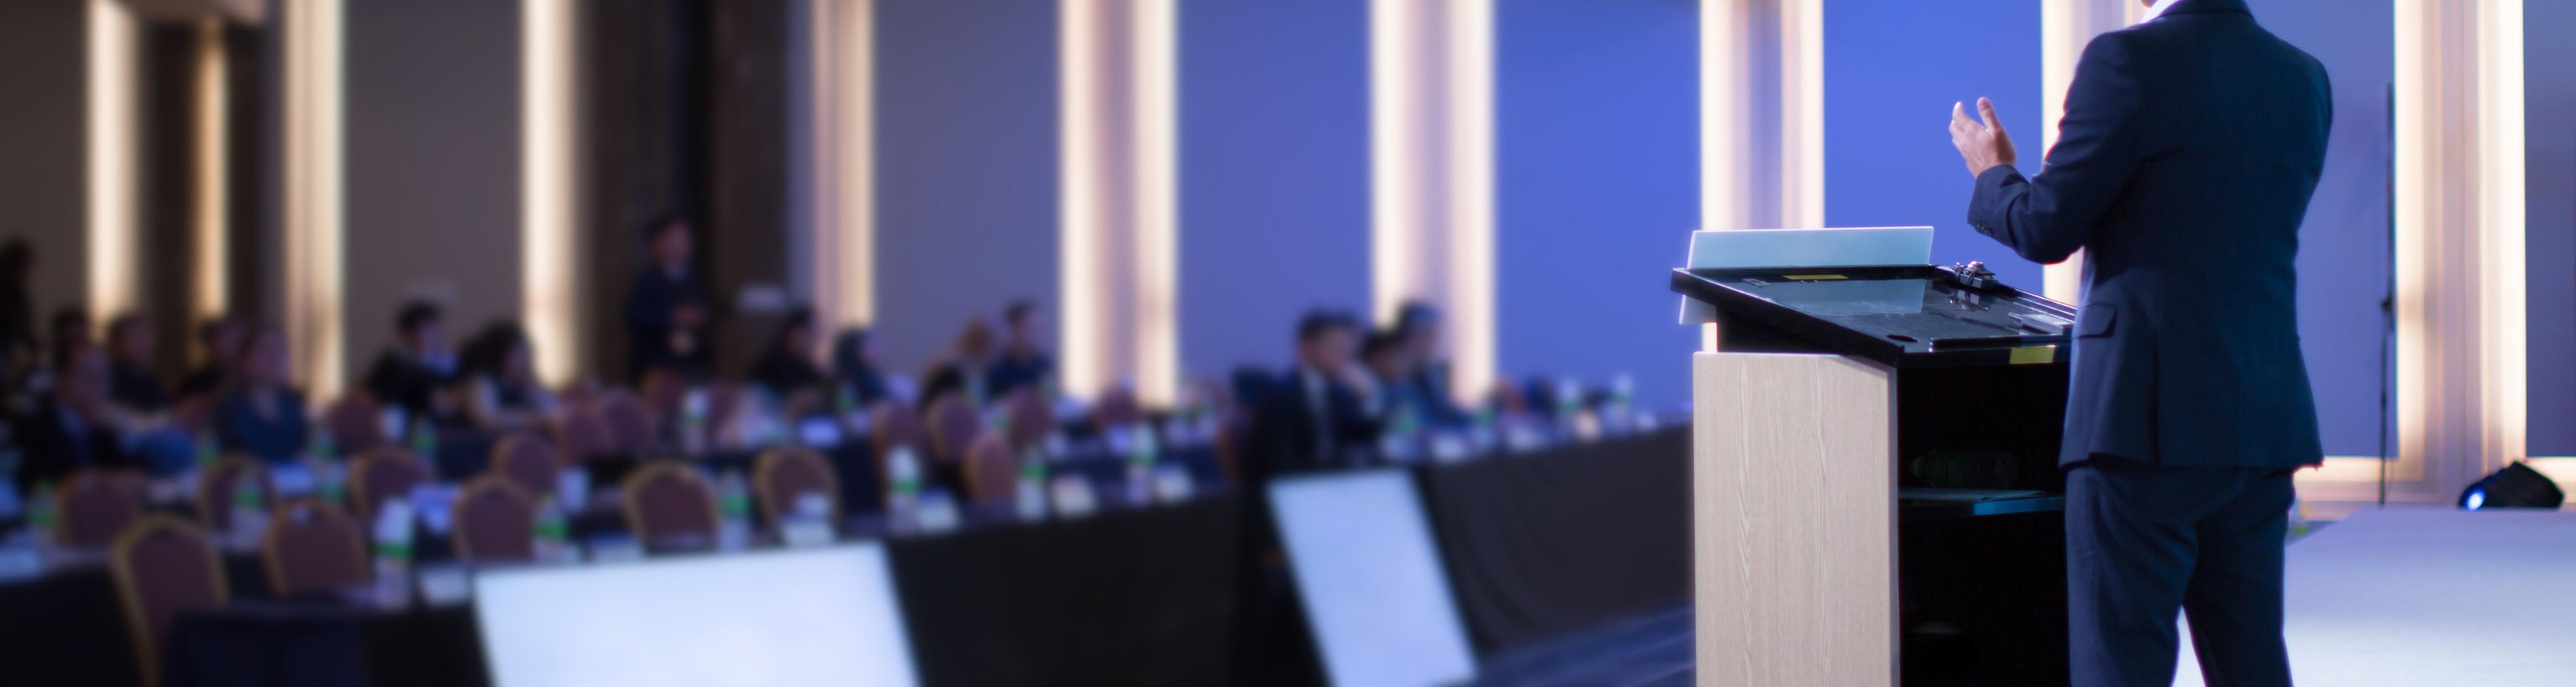 25 au 27 octobre 2019 : Congrès de l'ordre des experts-comptables